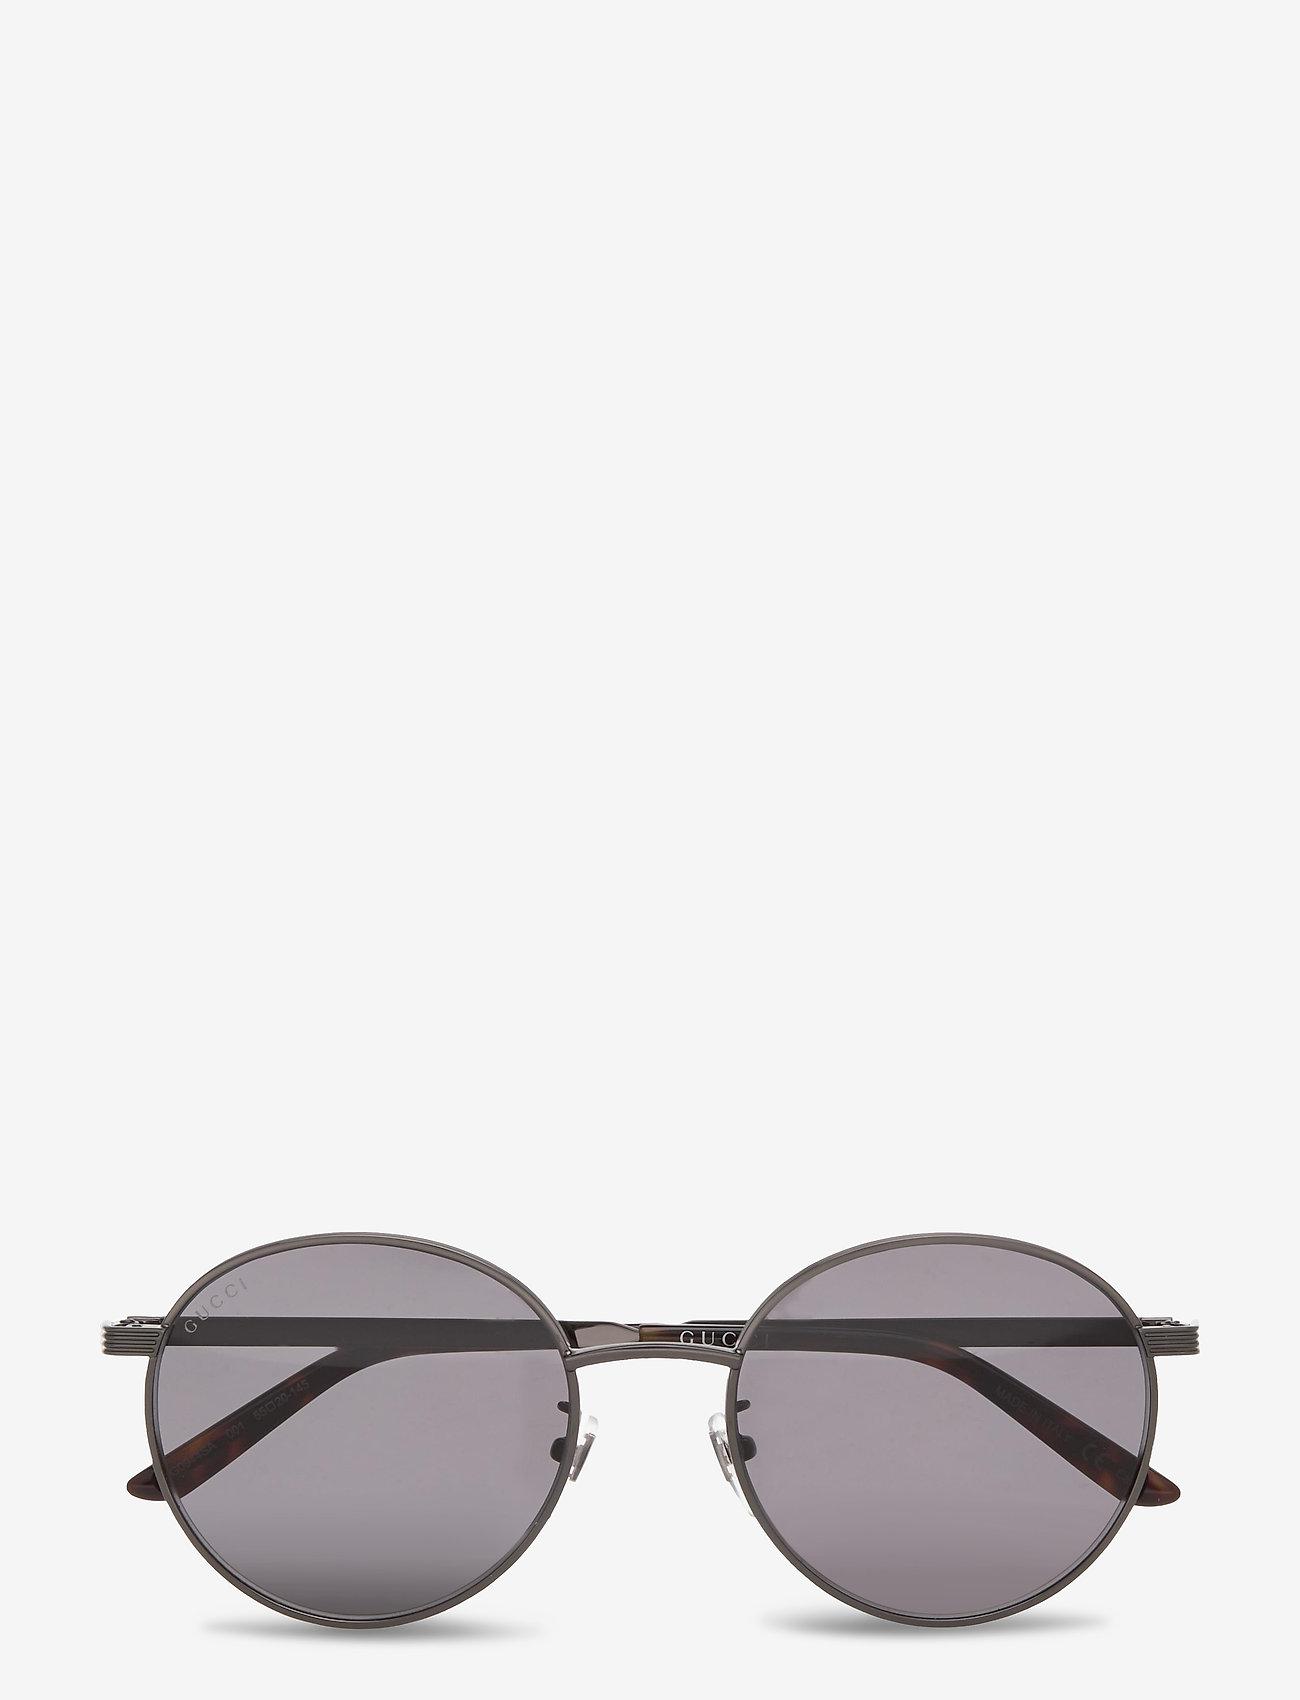 Gucci Sunglasses - GG0944SA - ronde zonnebril - ruthenium-ruthenium-grey - 0